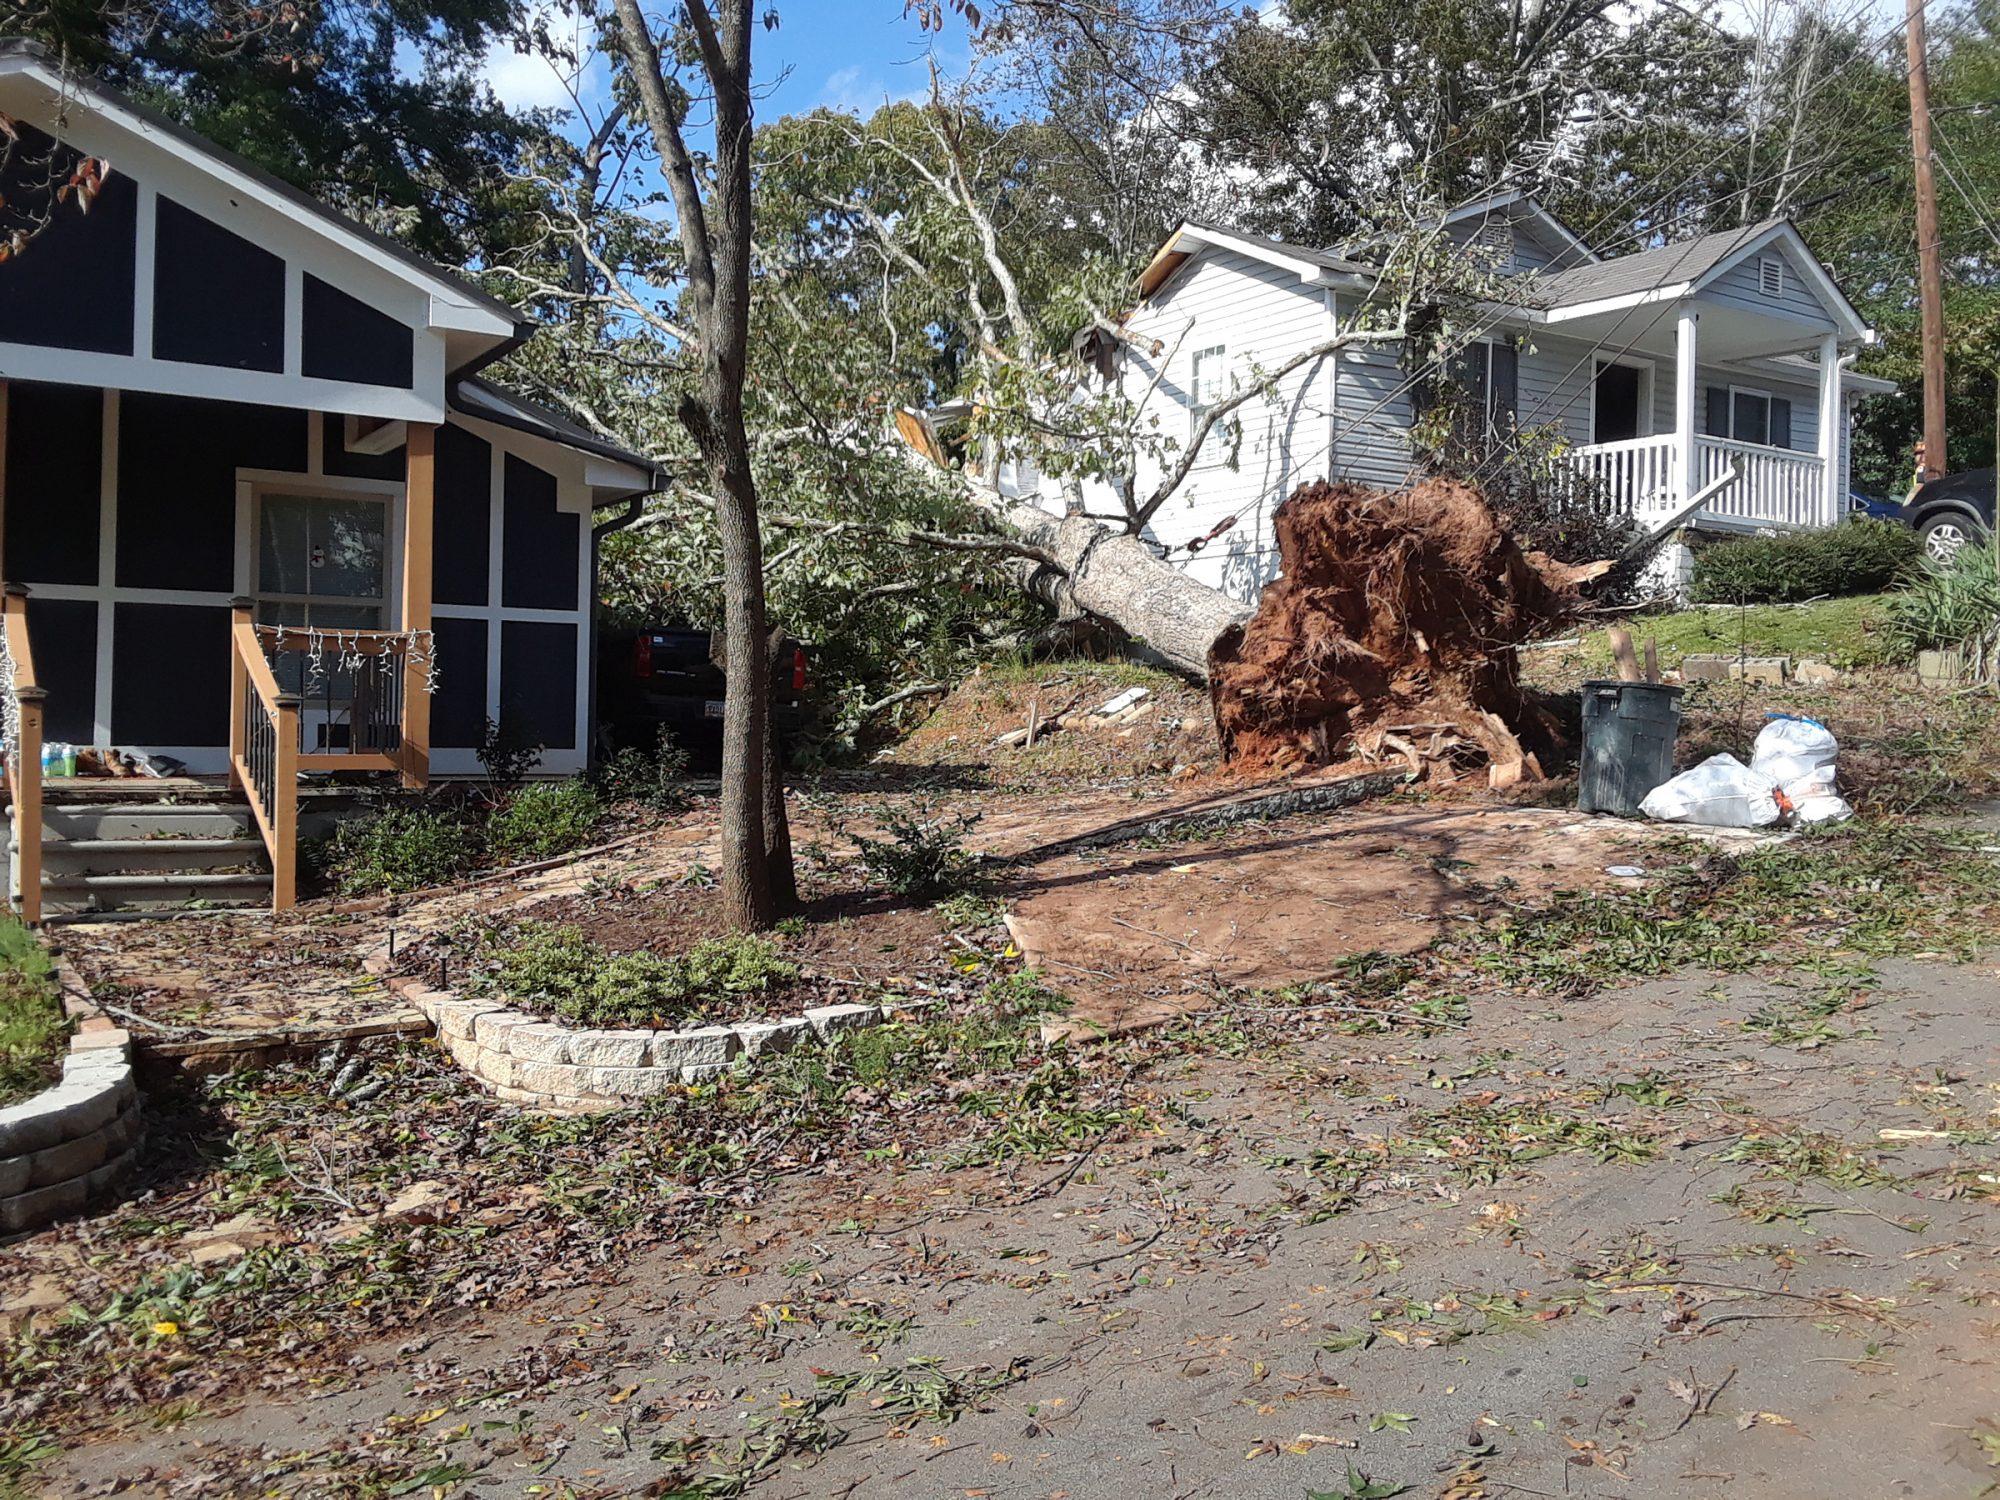 Tree on a house in Buford, Georgia